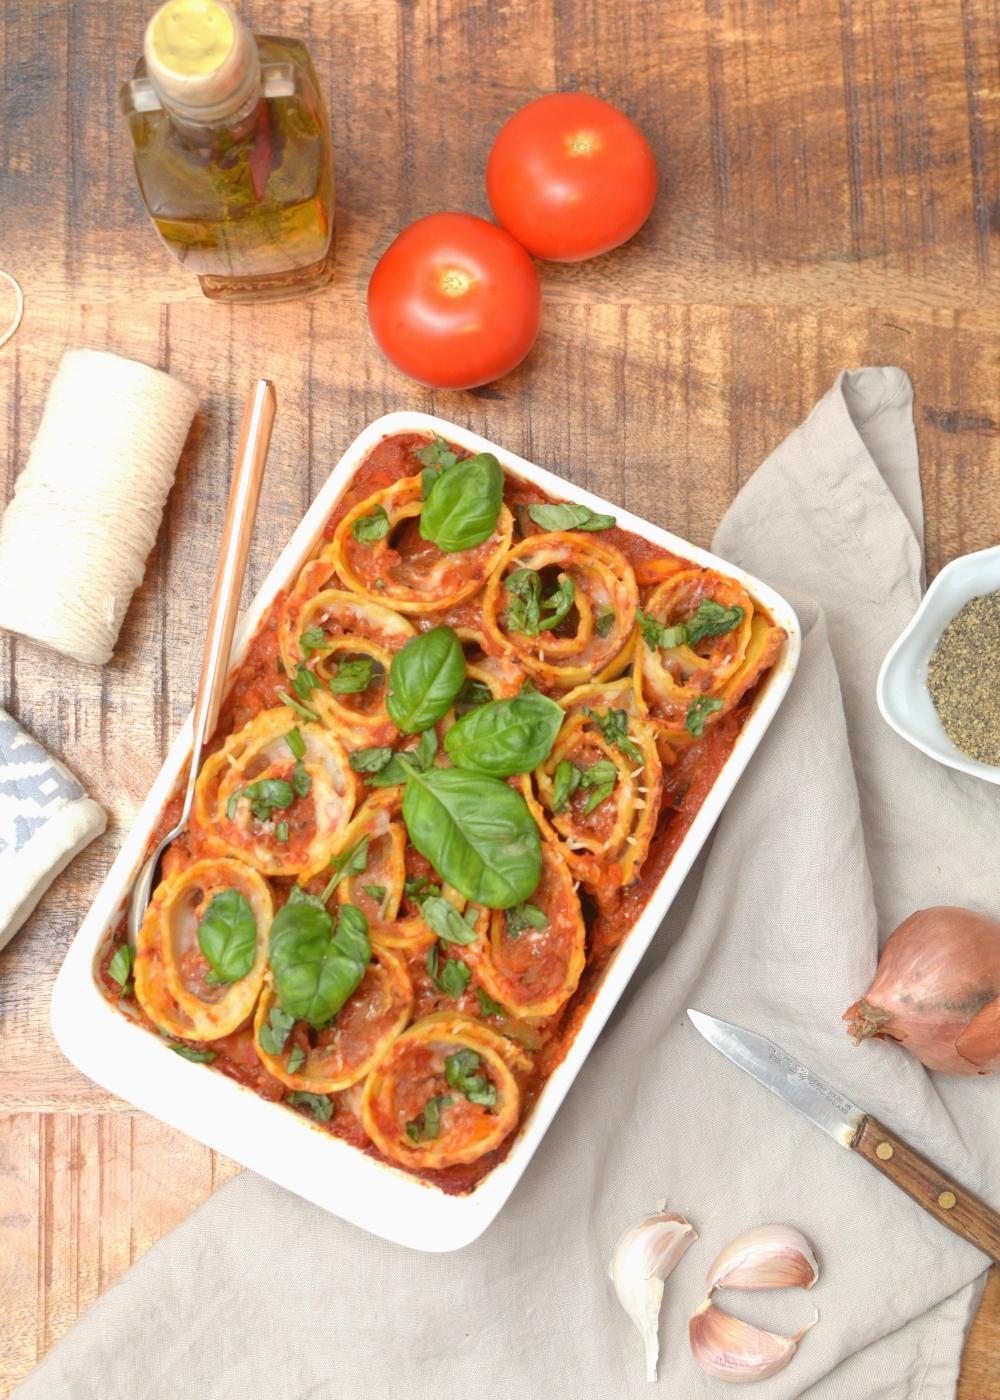 meditteranean-veggies-lasagna-roll-ups-with-bechamel-2b